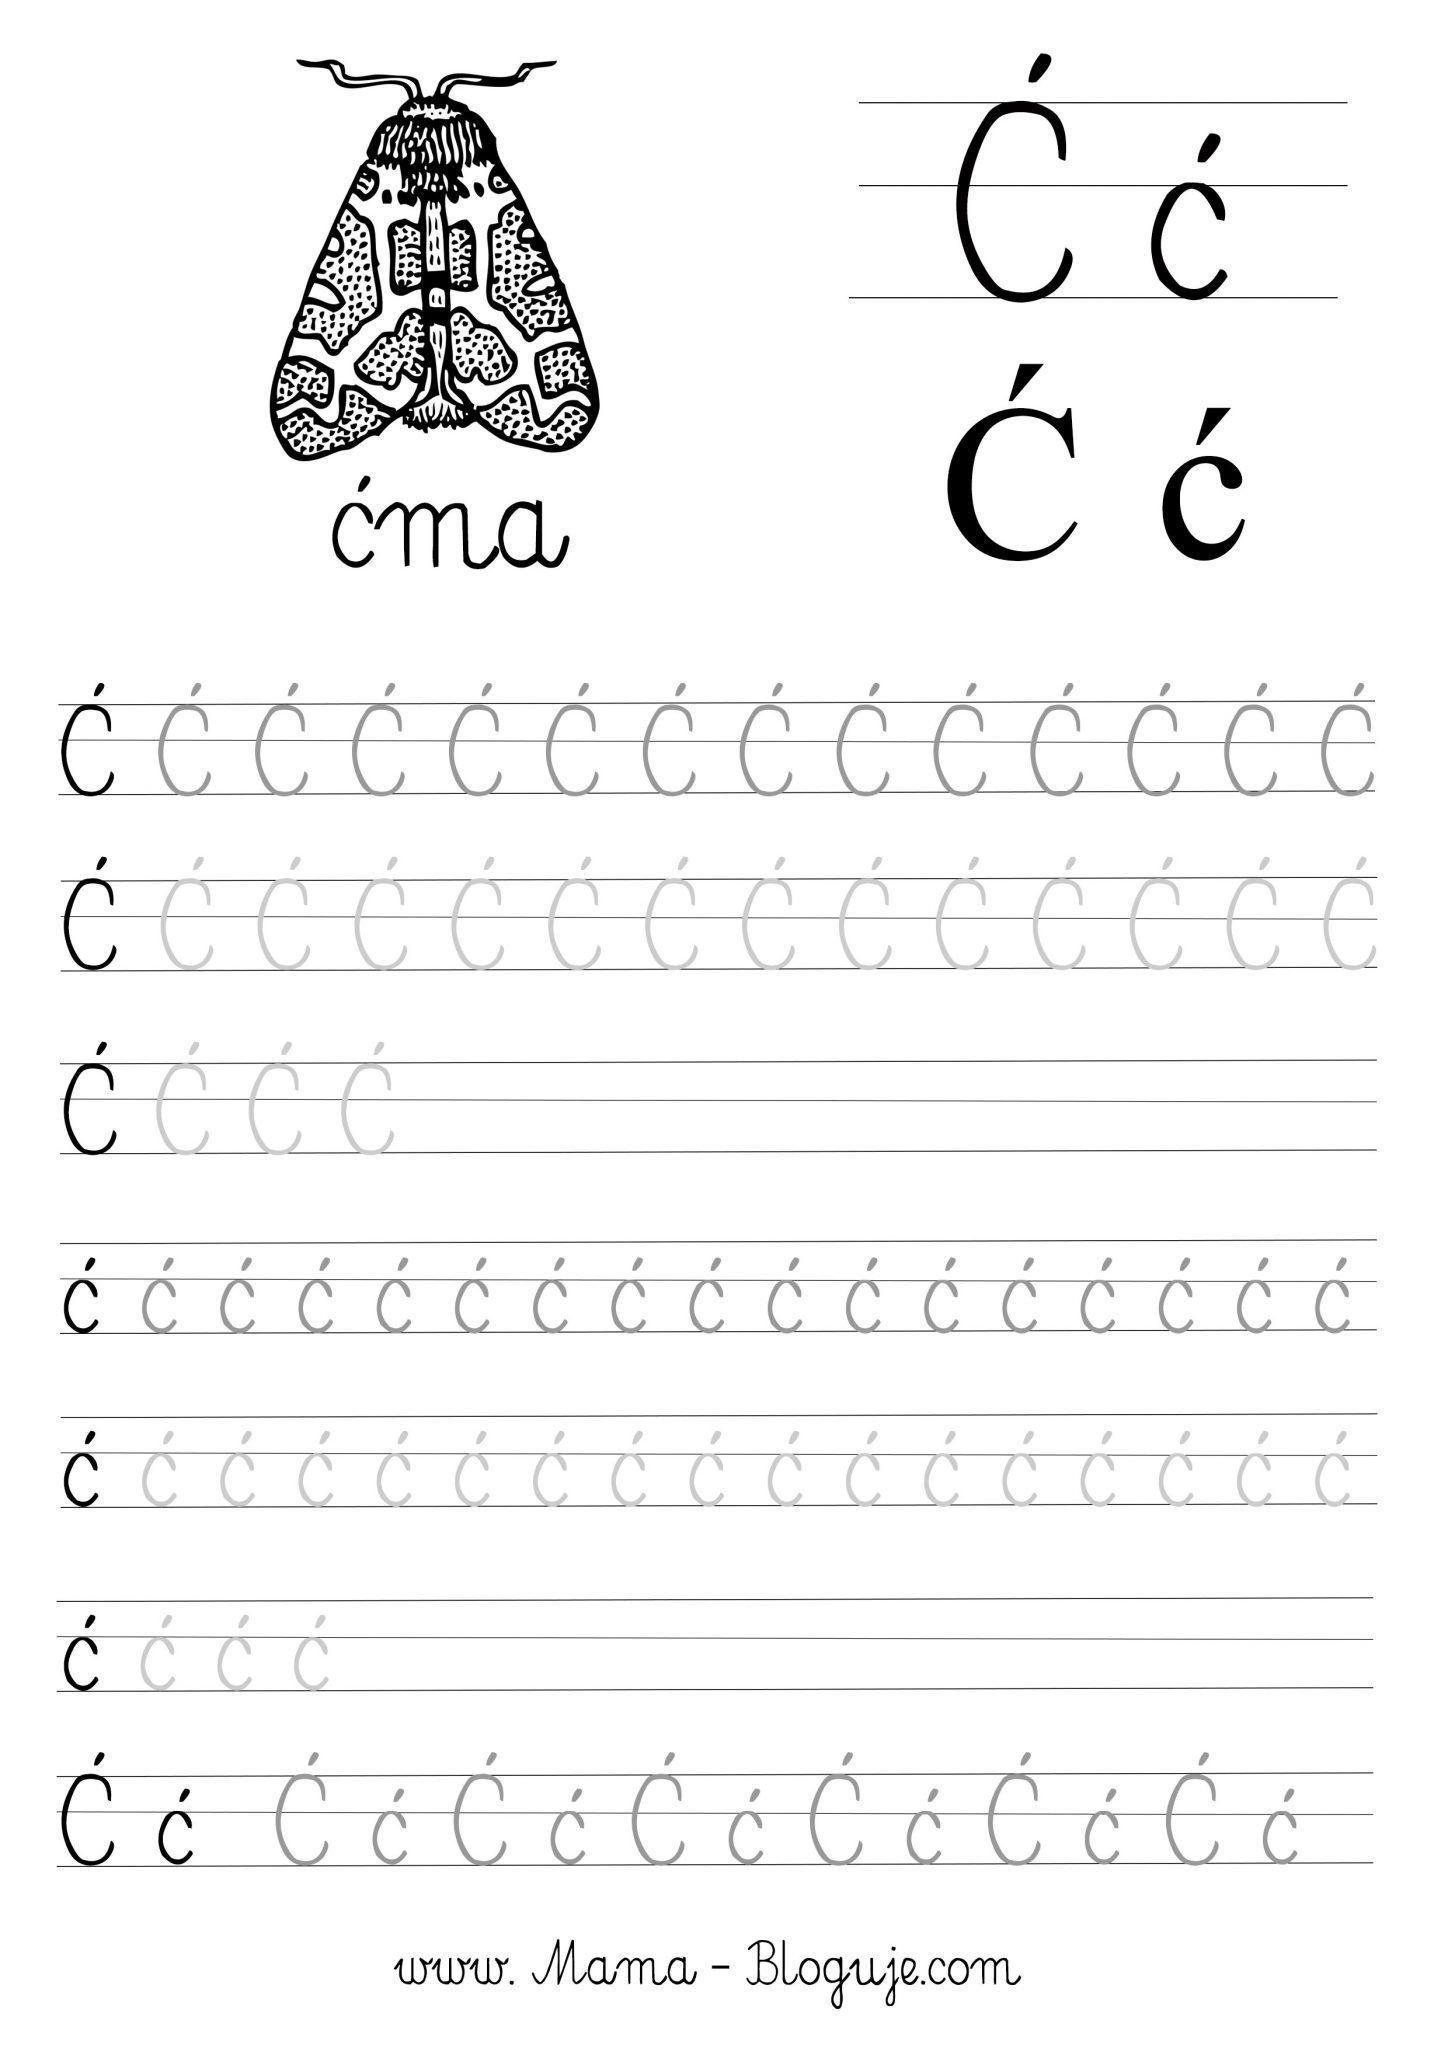 Szablony Do Nauki Pisania Polskie Literki Cz 3 Do Pobrania Easter Preschool Teaching Lettering